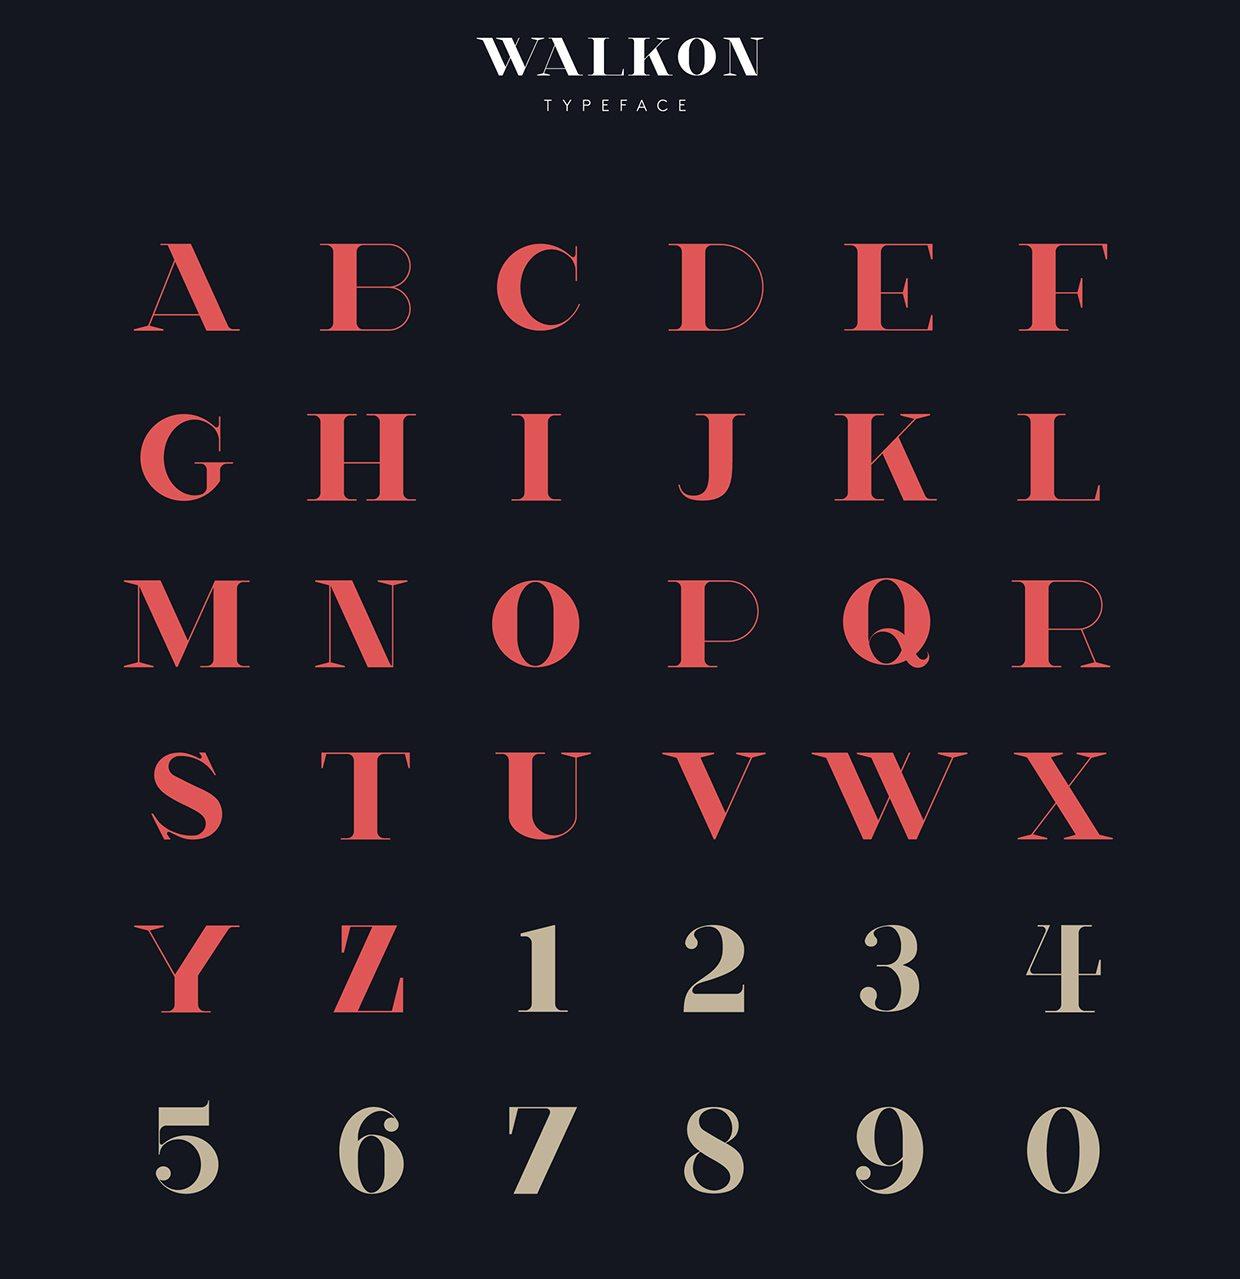 Font Walk on gliphs